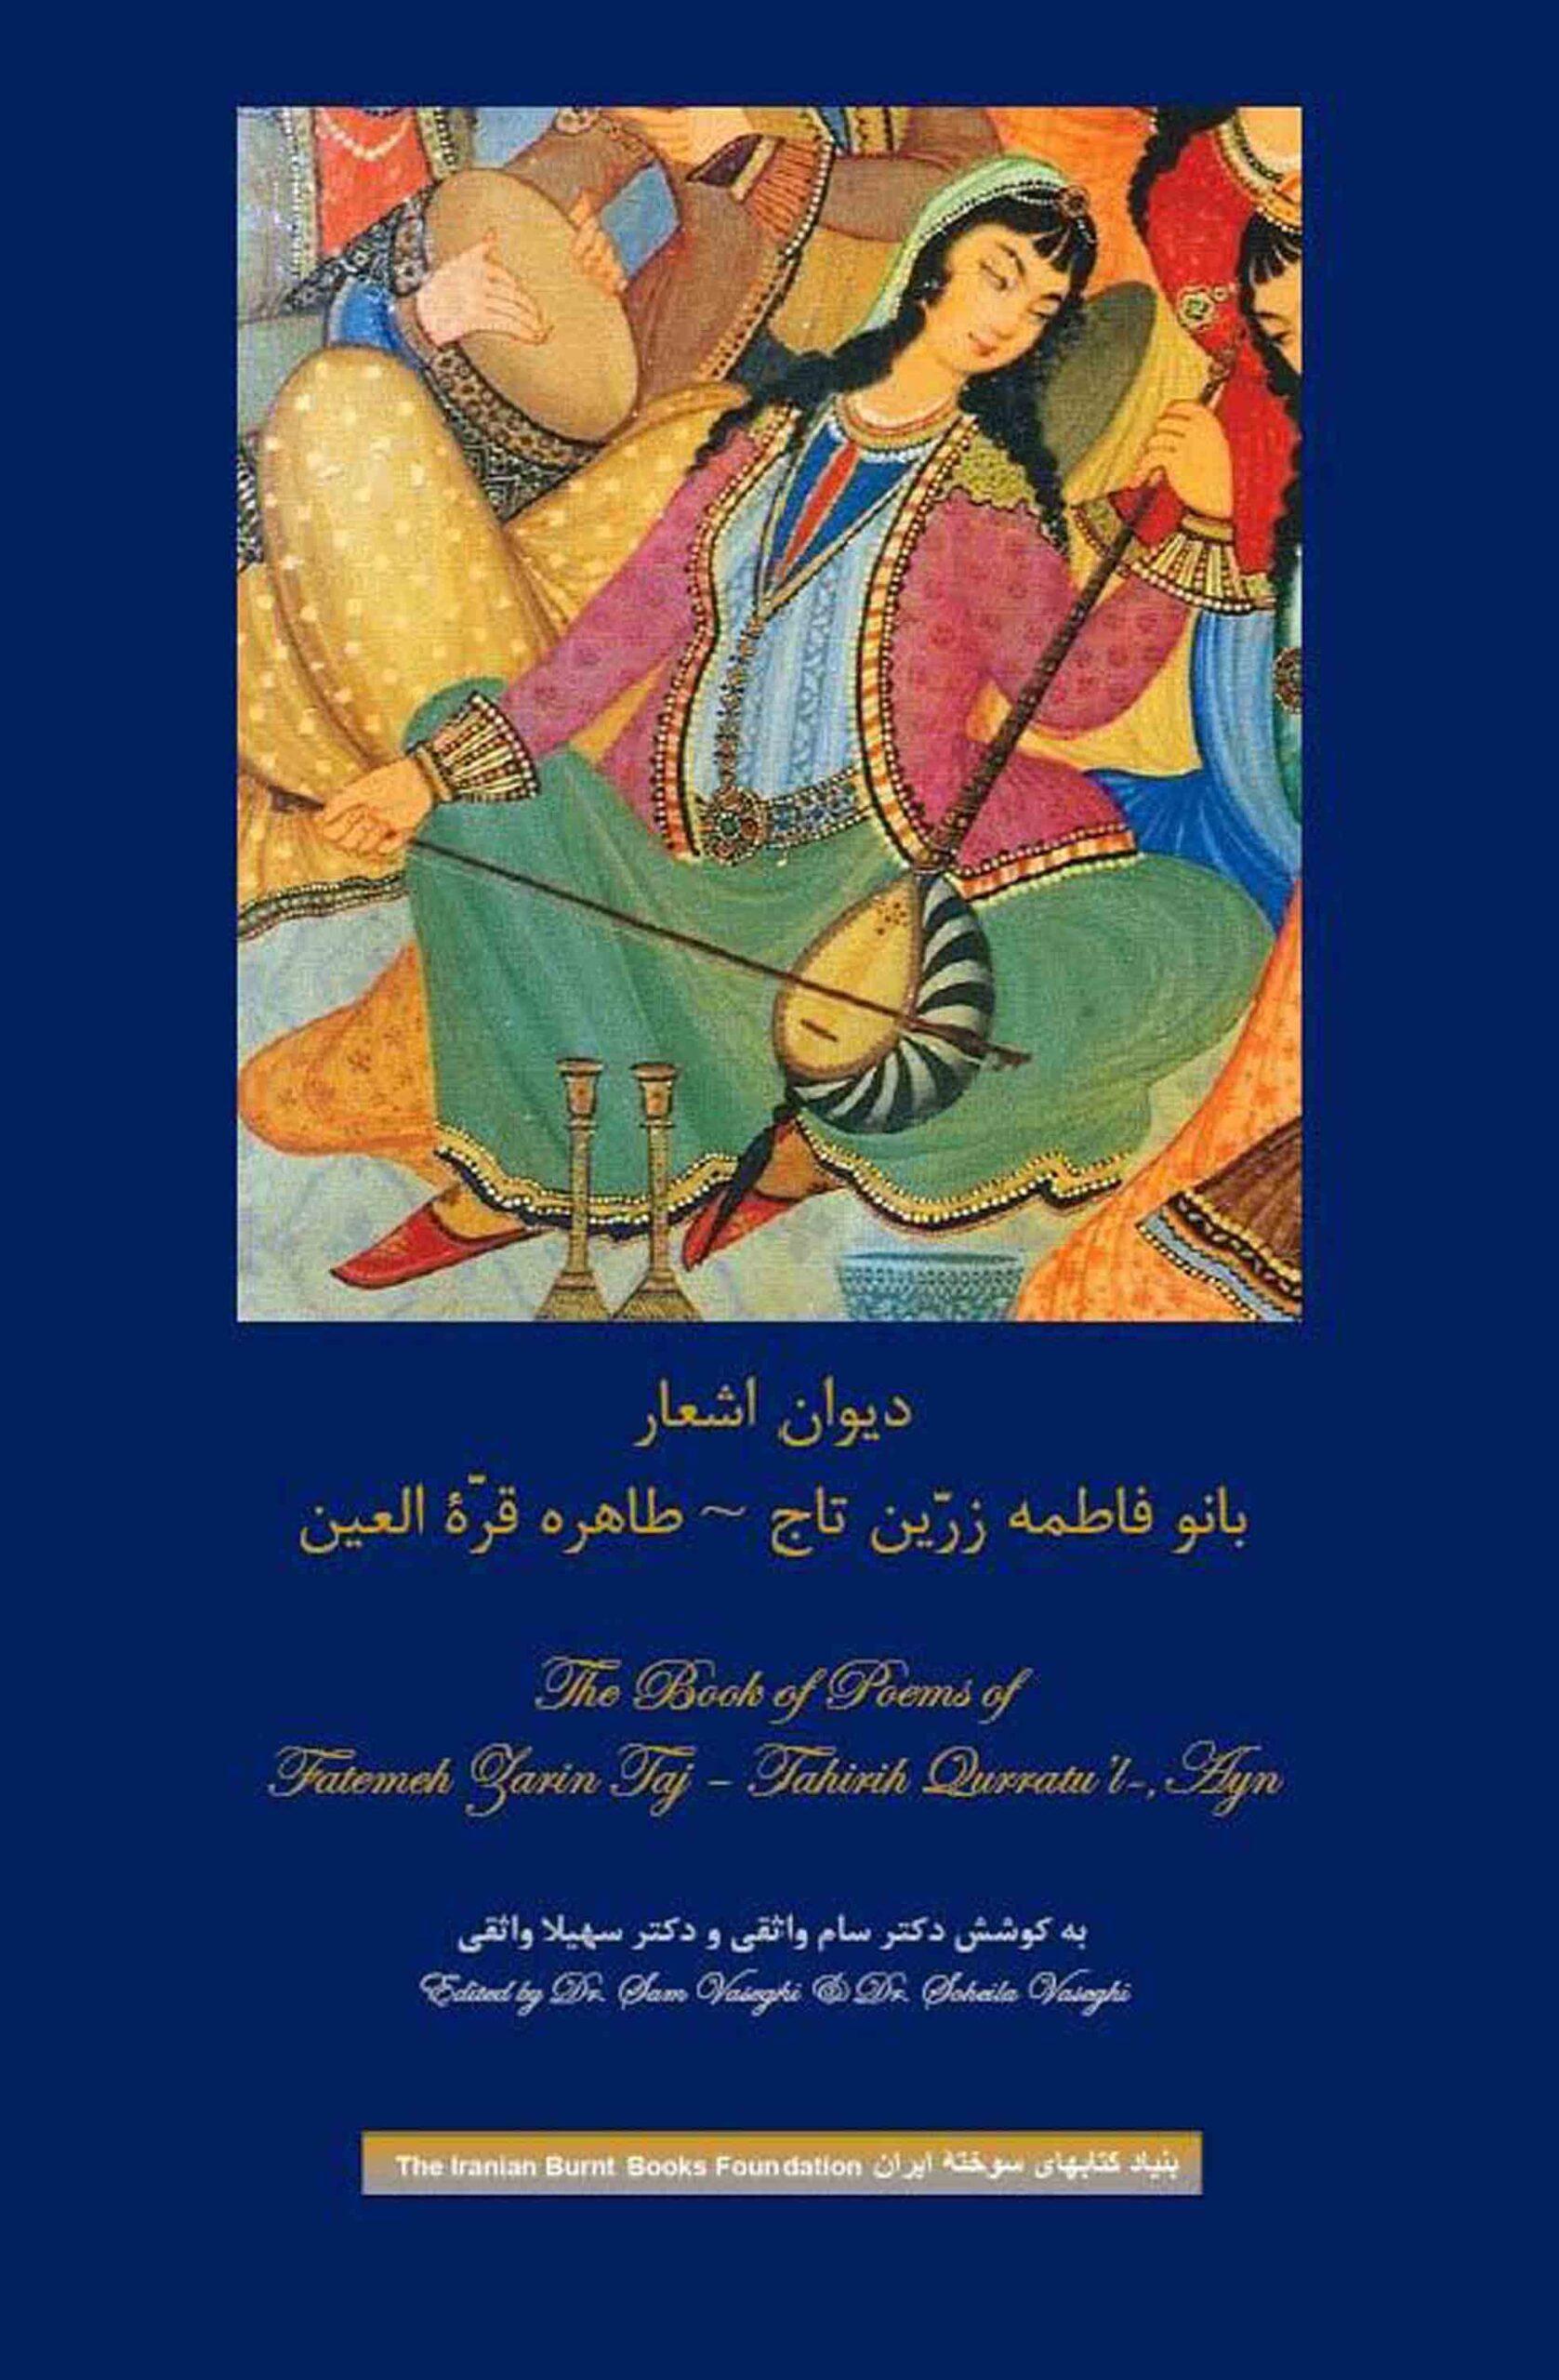 The Book of Poems of Fatemeh Zarin Taj